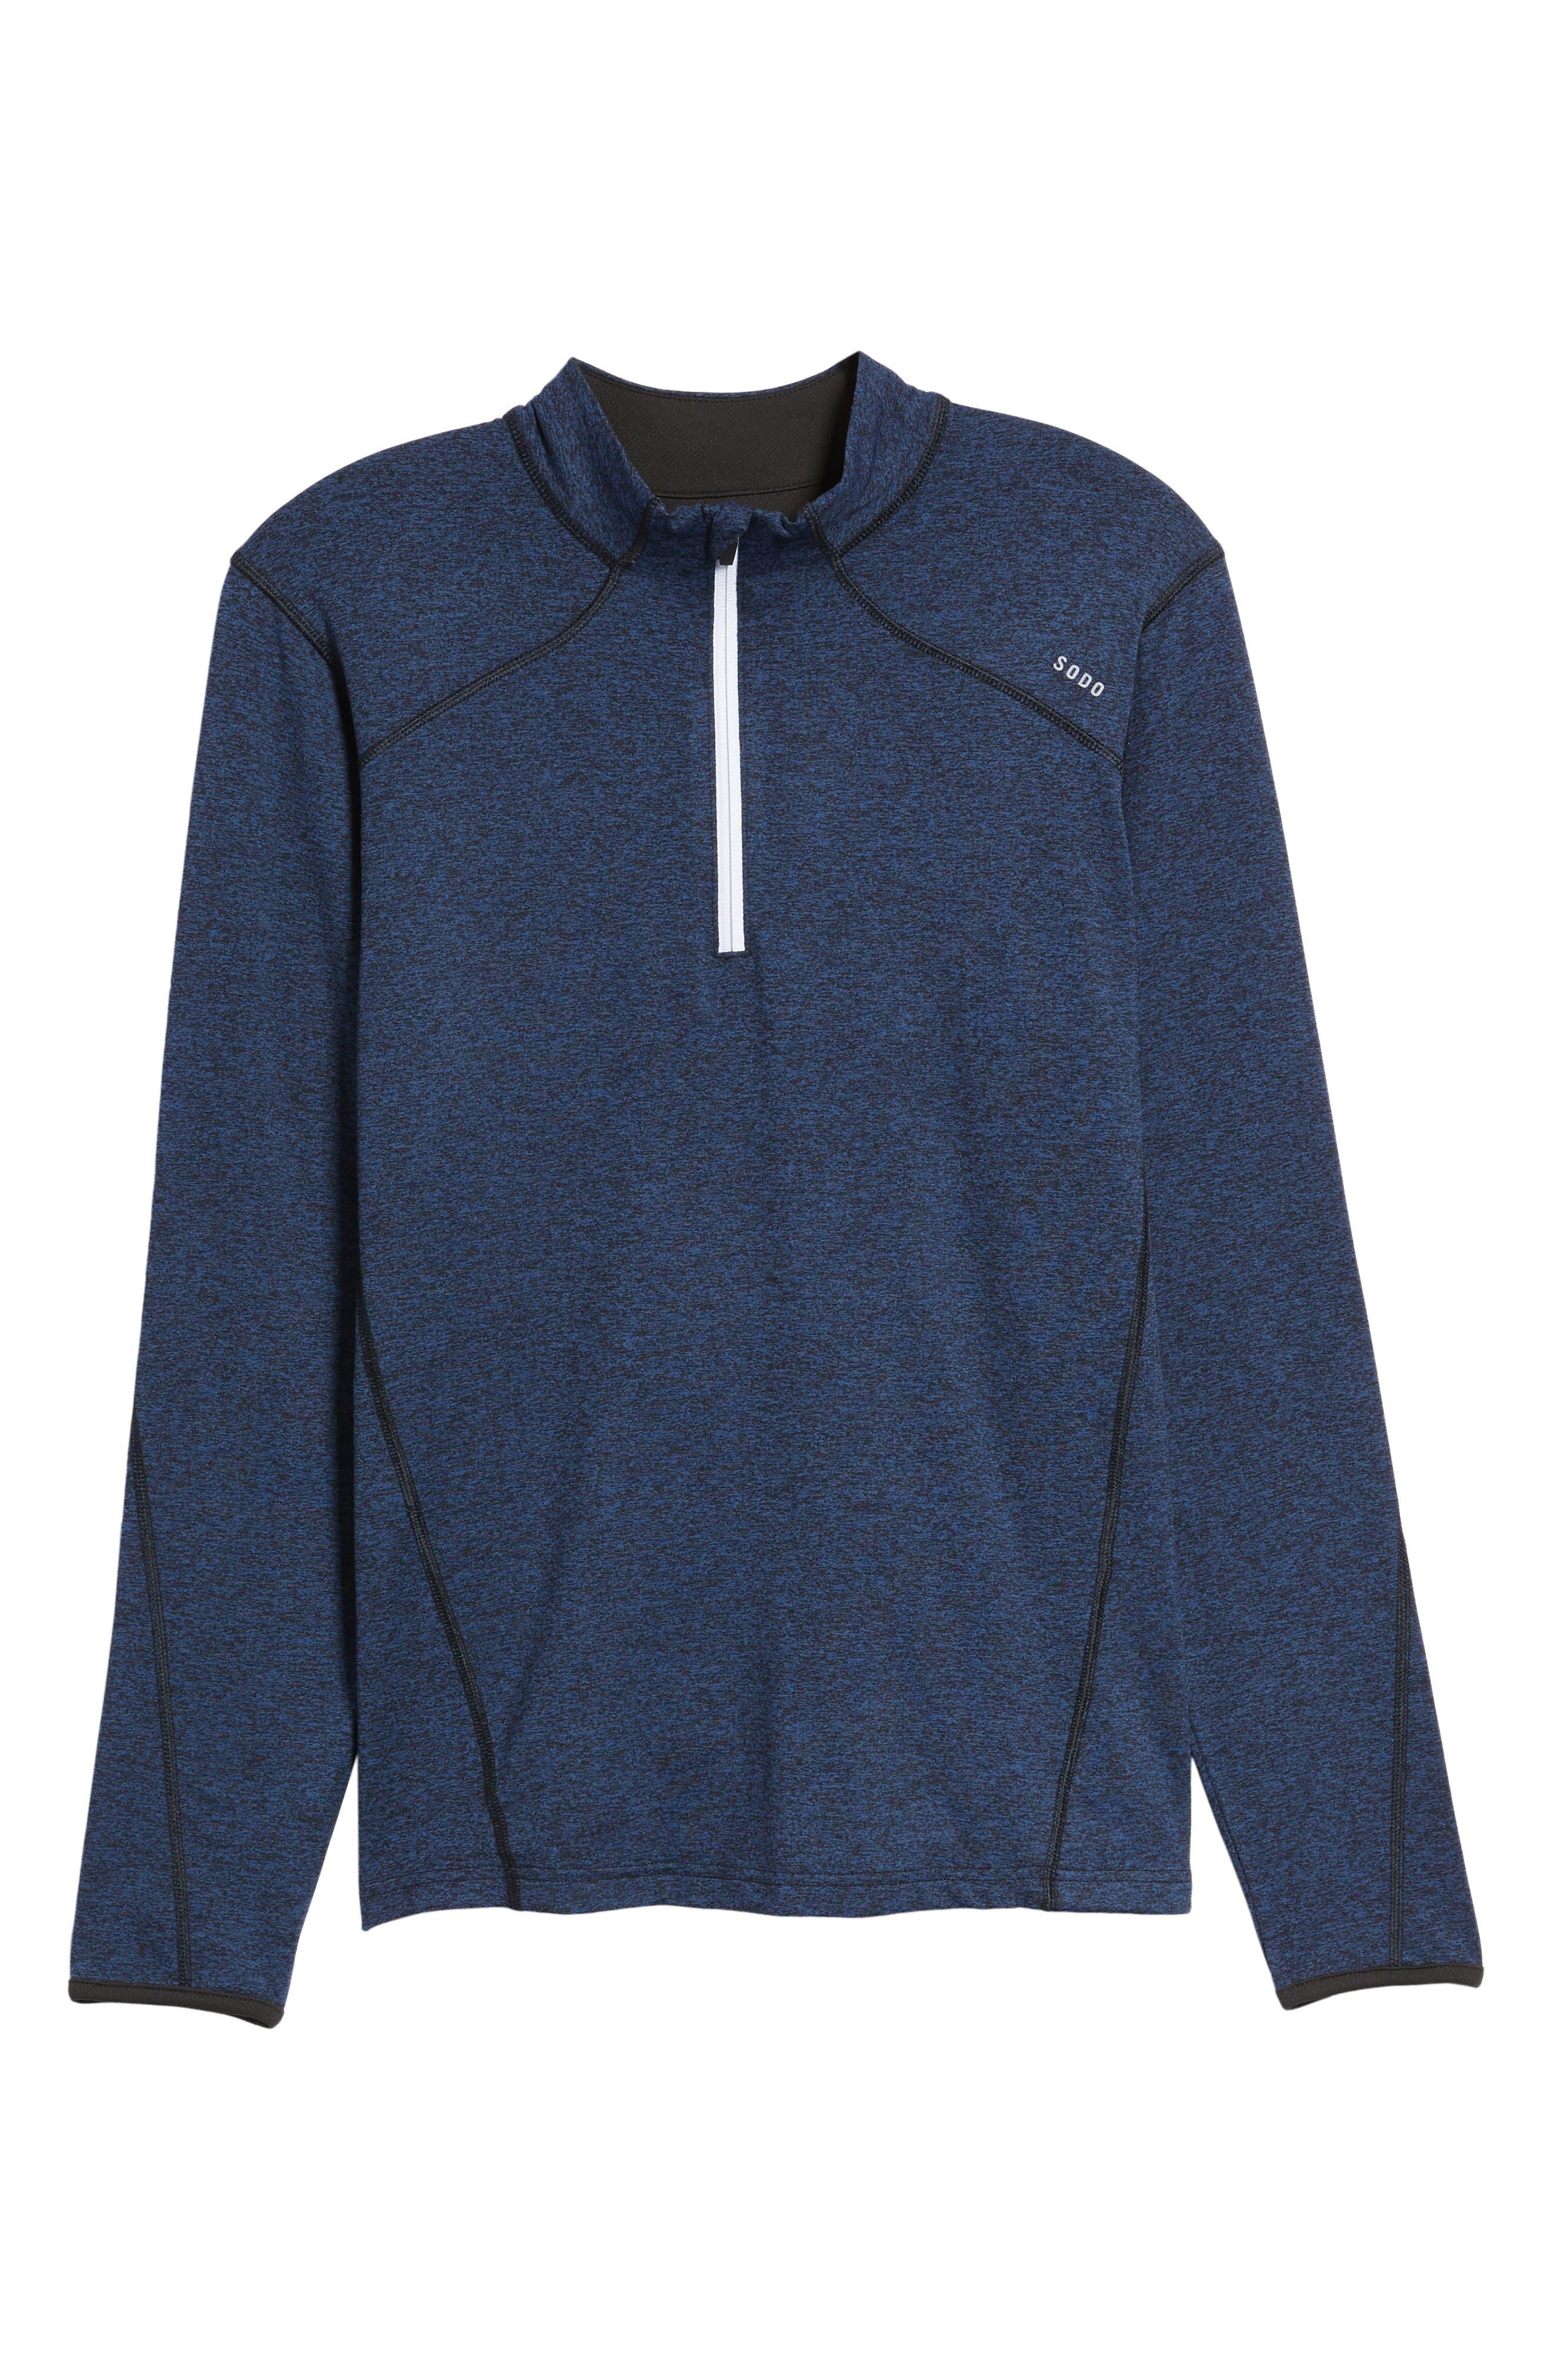 'Elevate' Moisture Wicking Stretch Quarter Zip Pullover,                         Main,                         color, Navy Black/ Black/ White